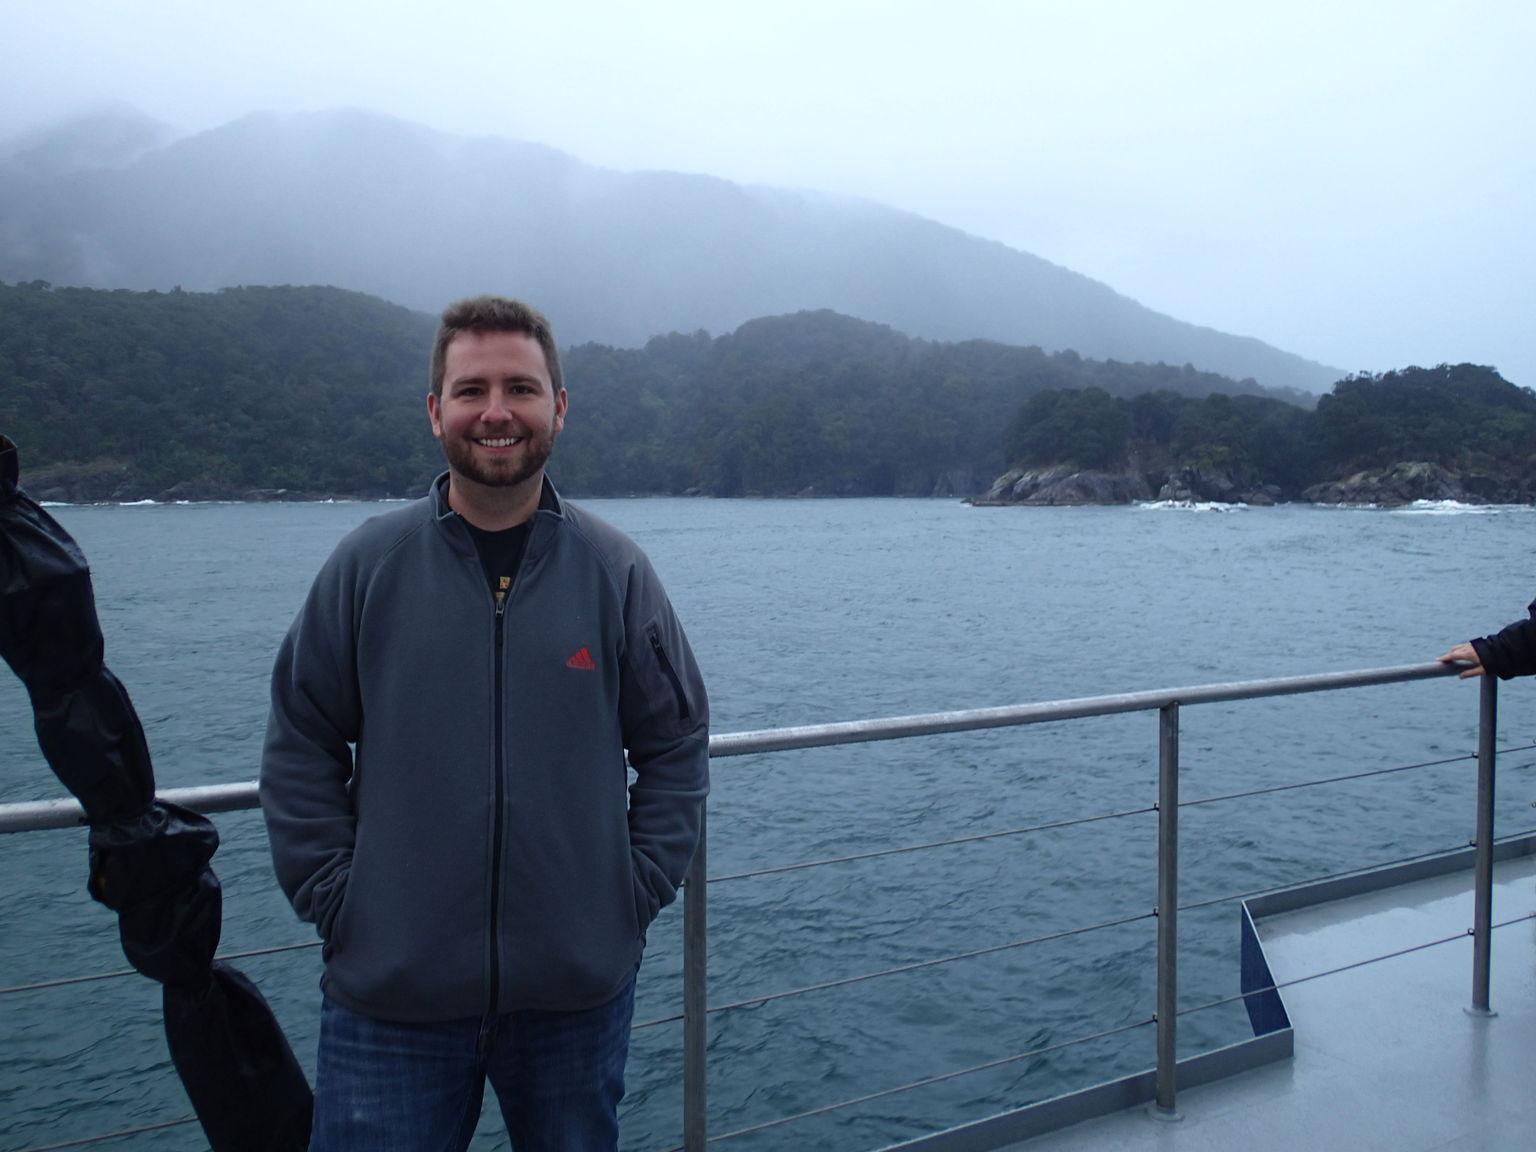 MÁS FOTOS, Milford Sound Mariner Overnight Cruise